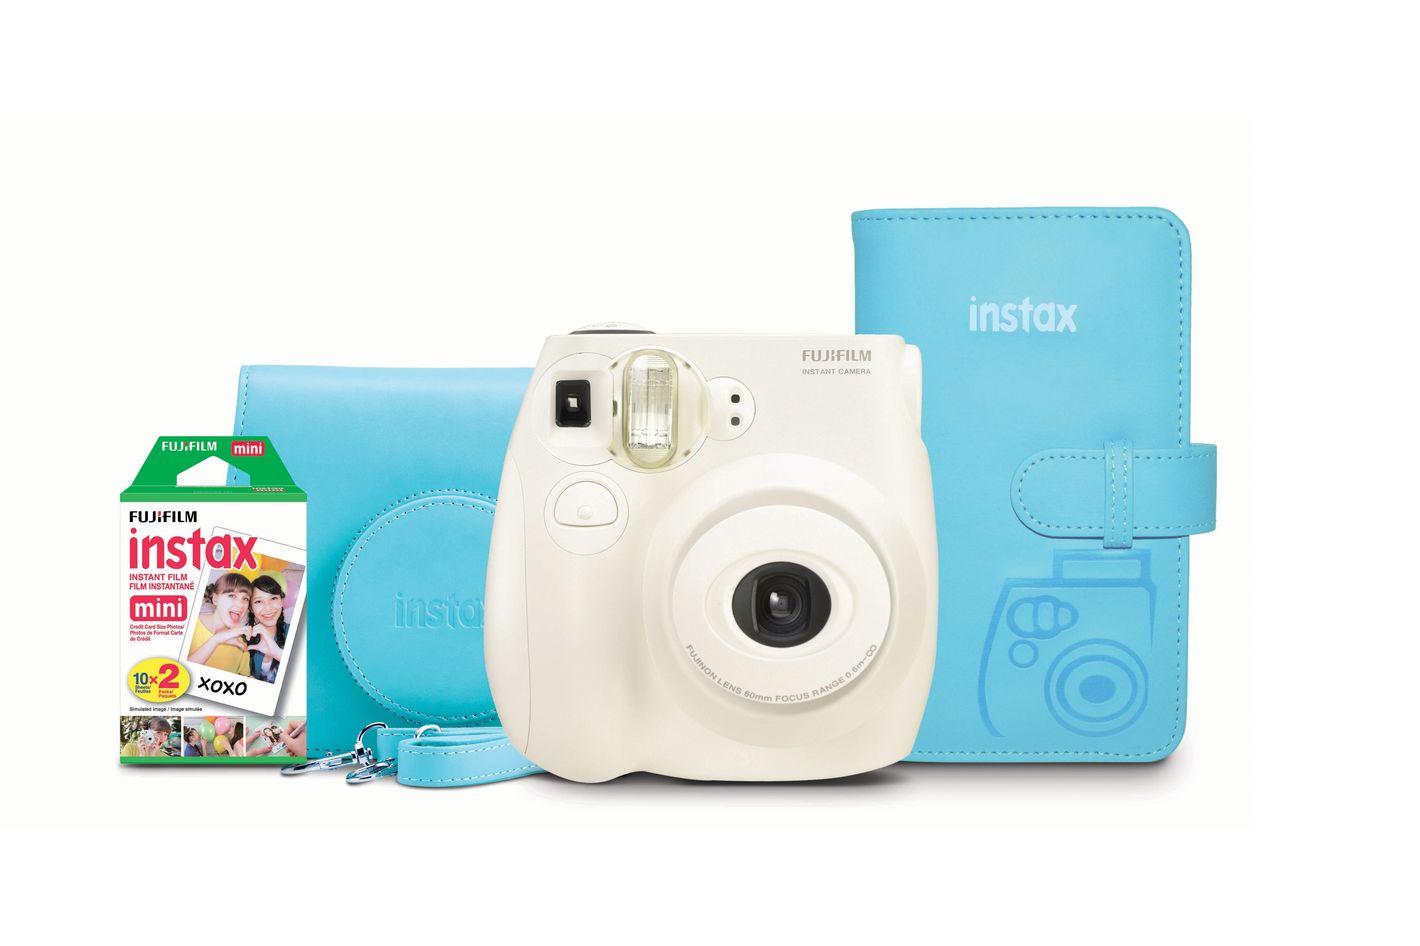 Fujifilm Instax Mini 7s Holiday Bundle